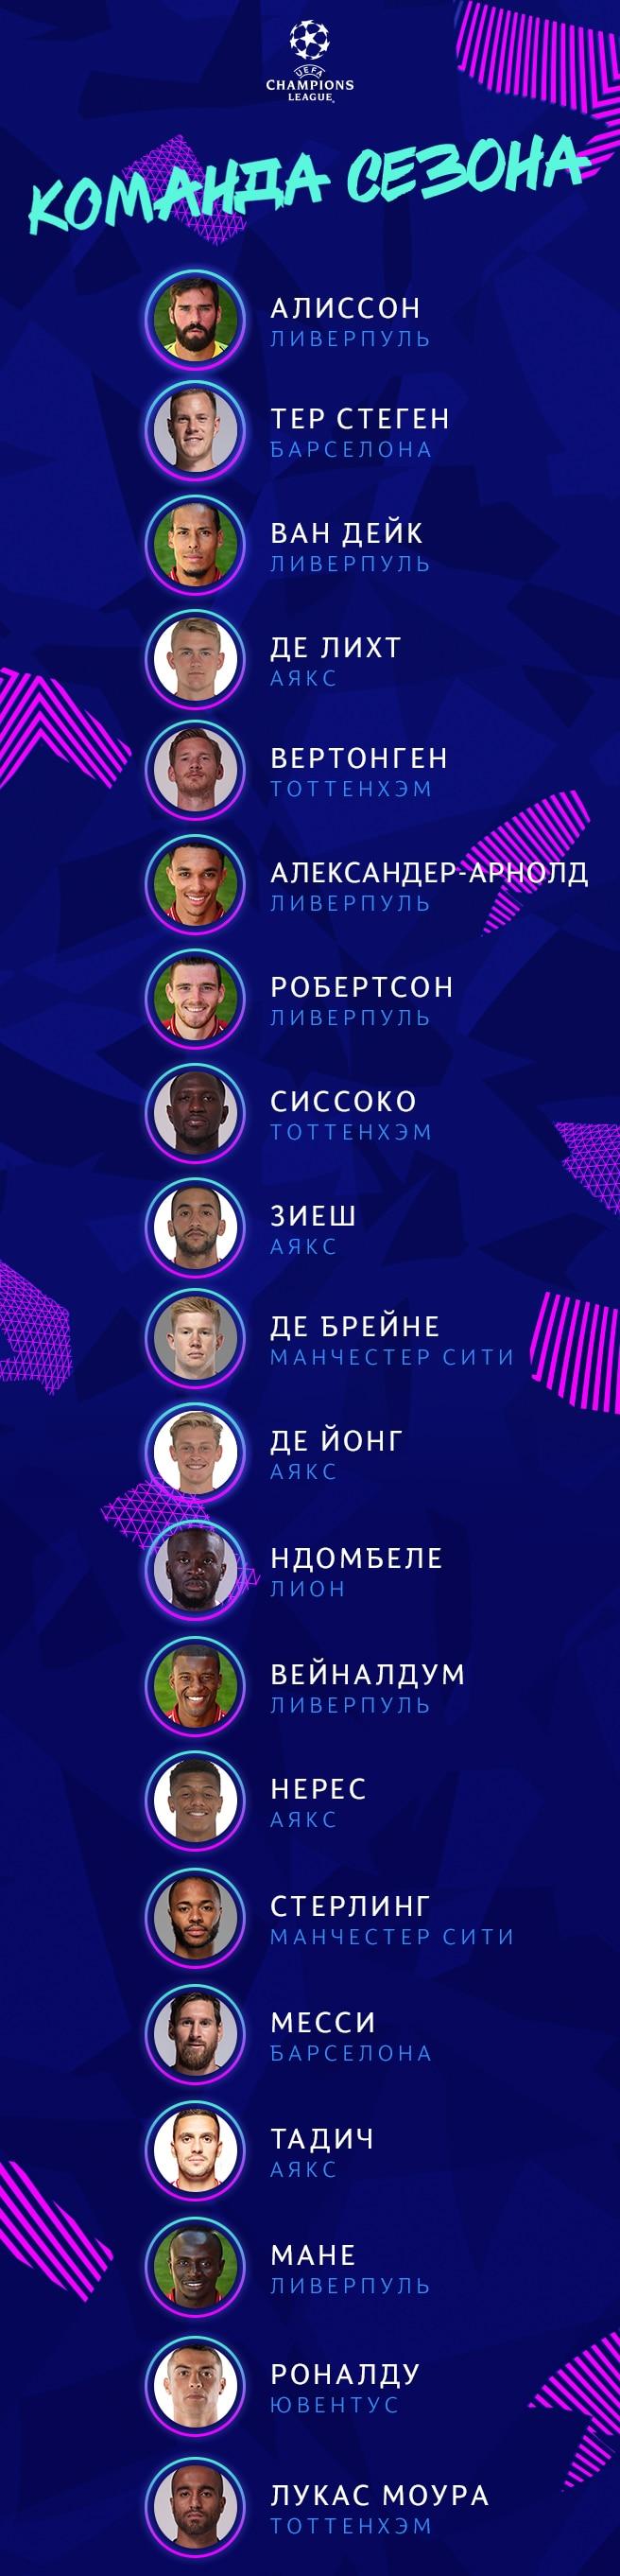 SOTS 2019 RU